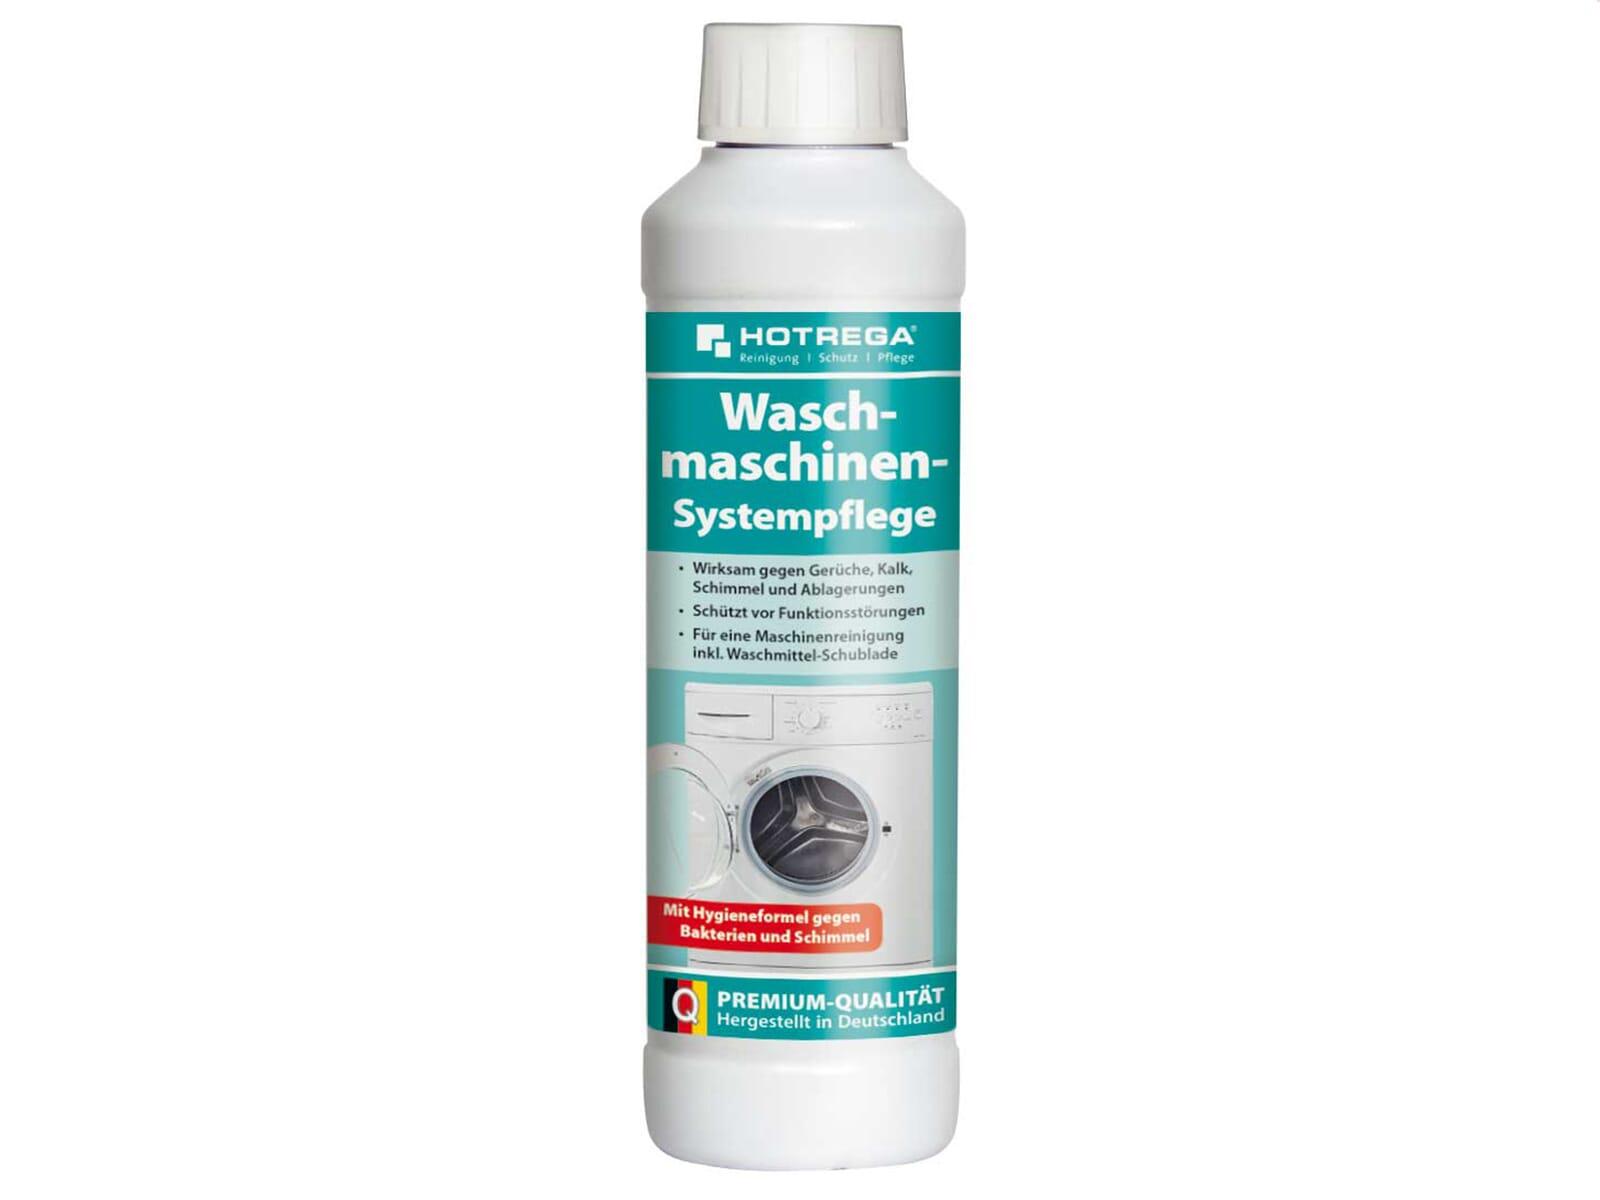 Hotrega H110290 Waschmaschinen-Systempflege